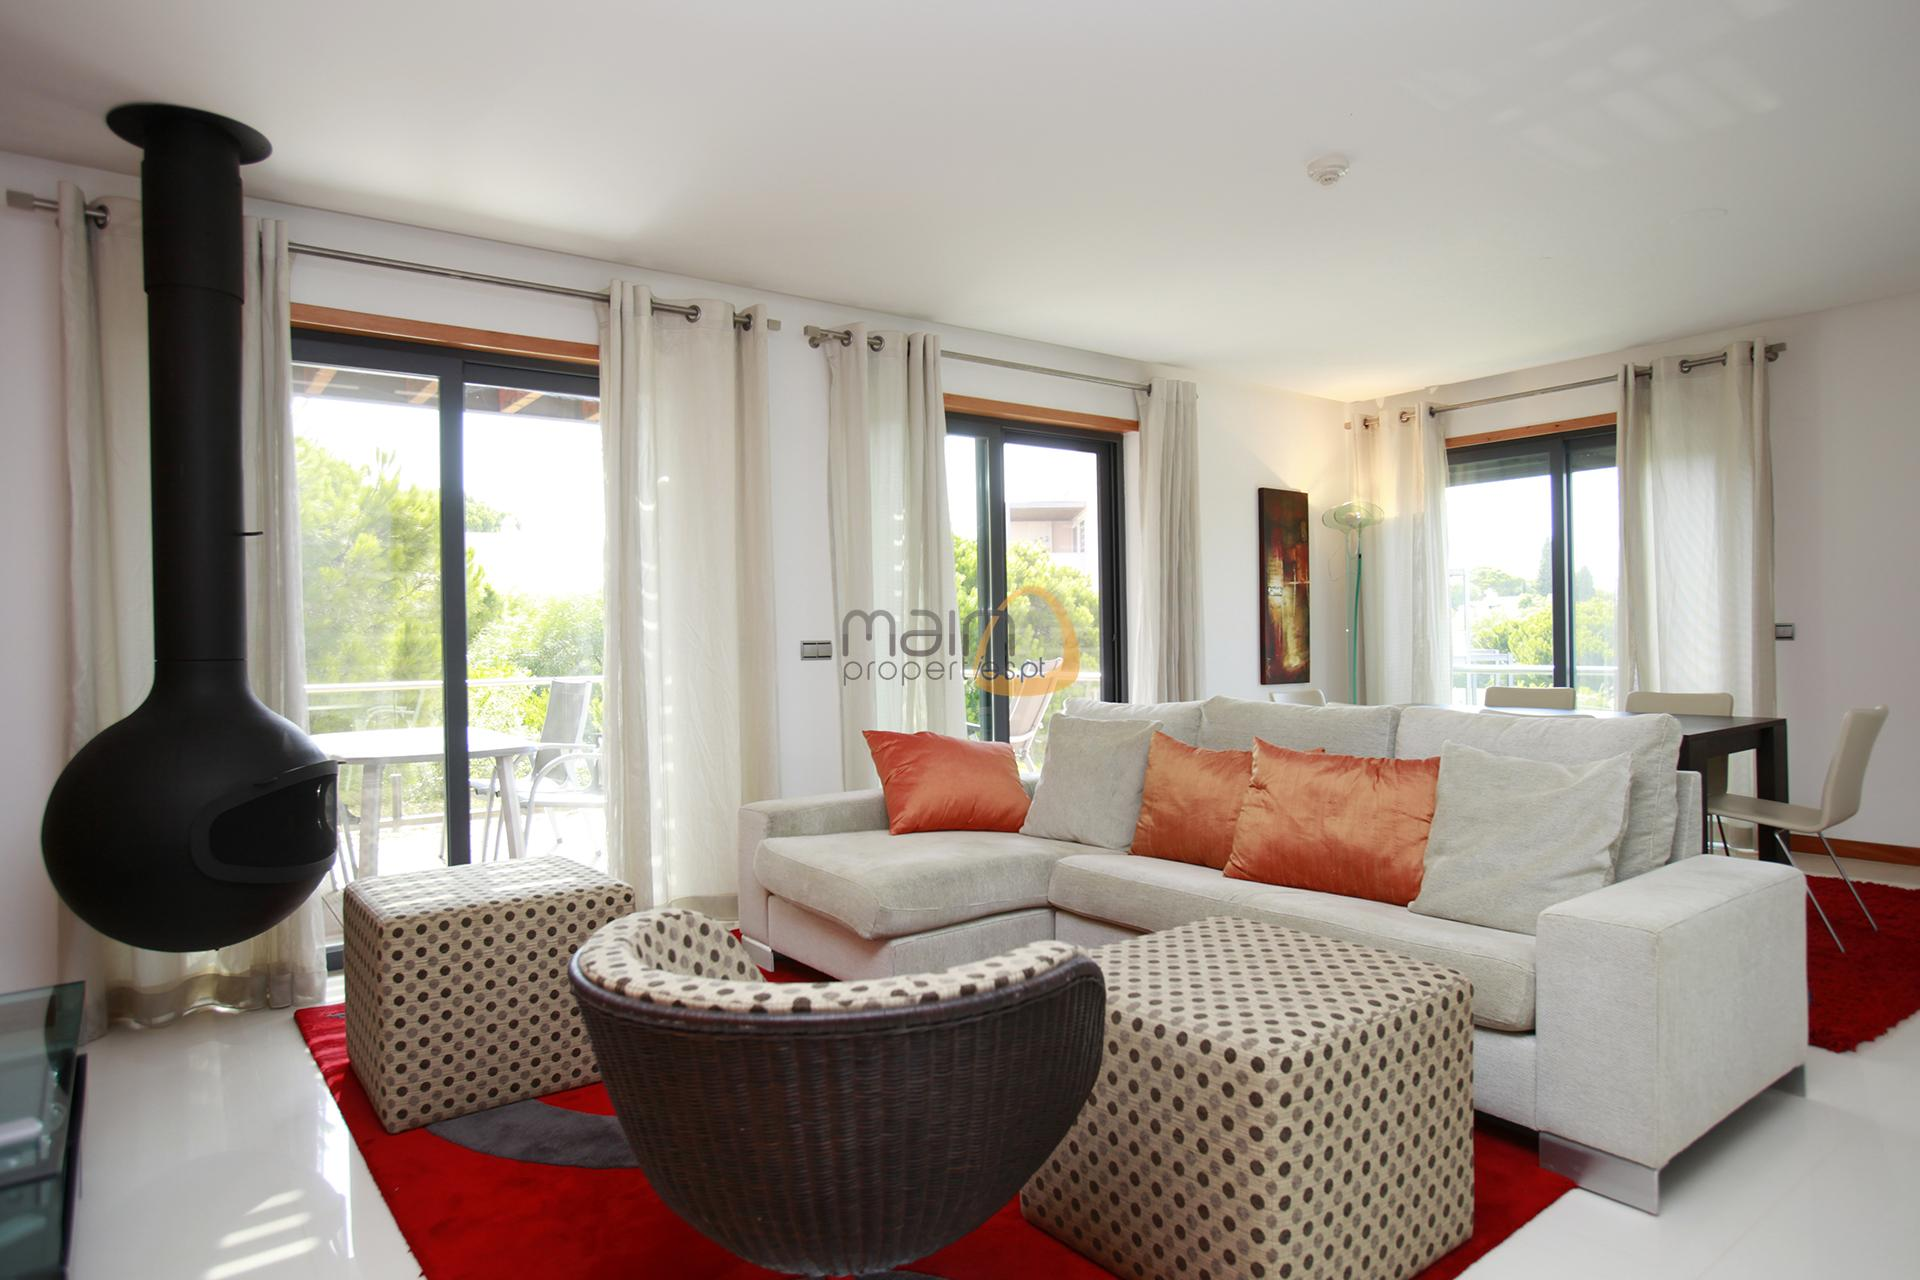 apartment-in-vale-do-lobo-algarve-golden-triangle-portugal-property-real-estate-mainproperties-mp135vdl-0